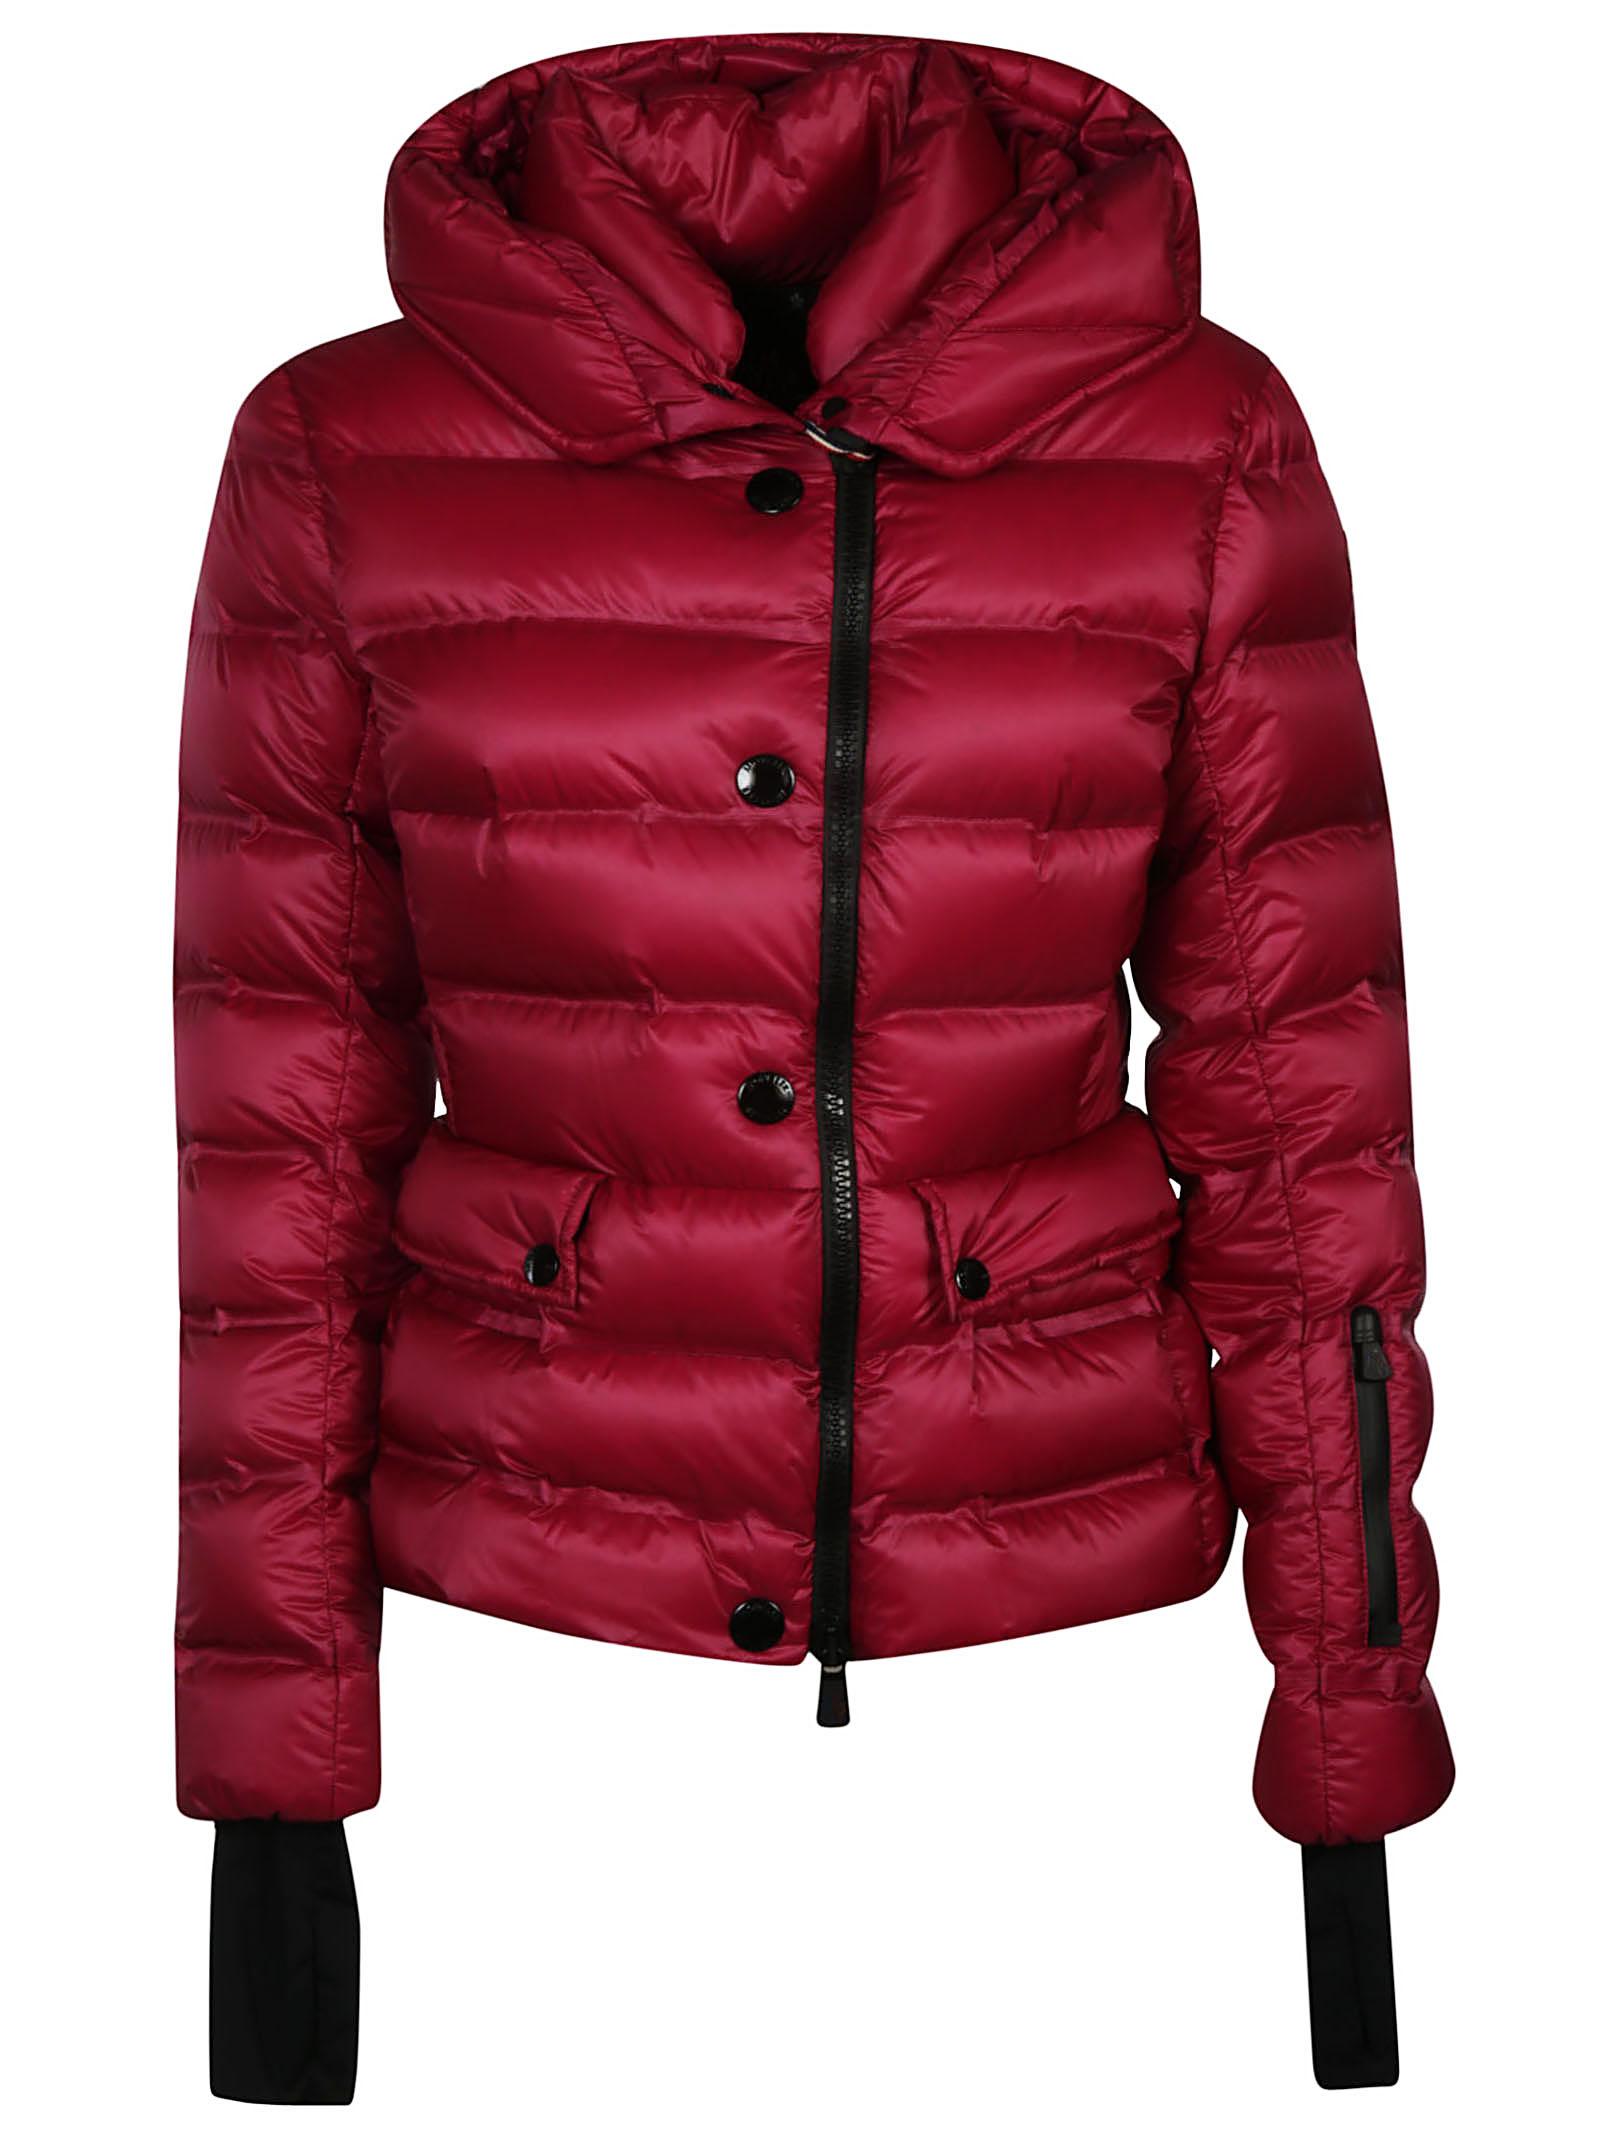 Photo of  Moncler Armotech Padded Jacket- shop Moncler jackets online sales